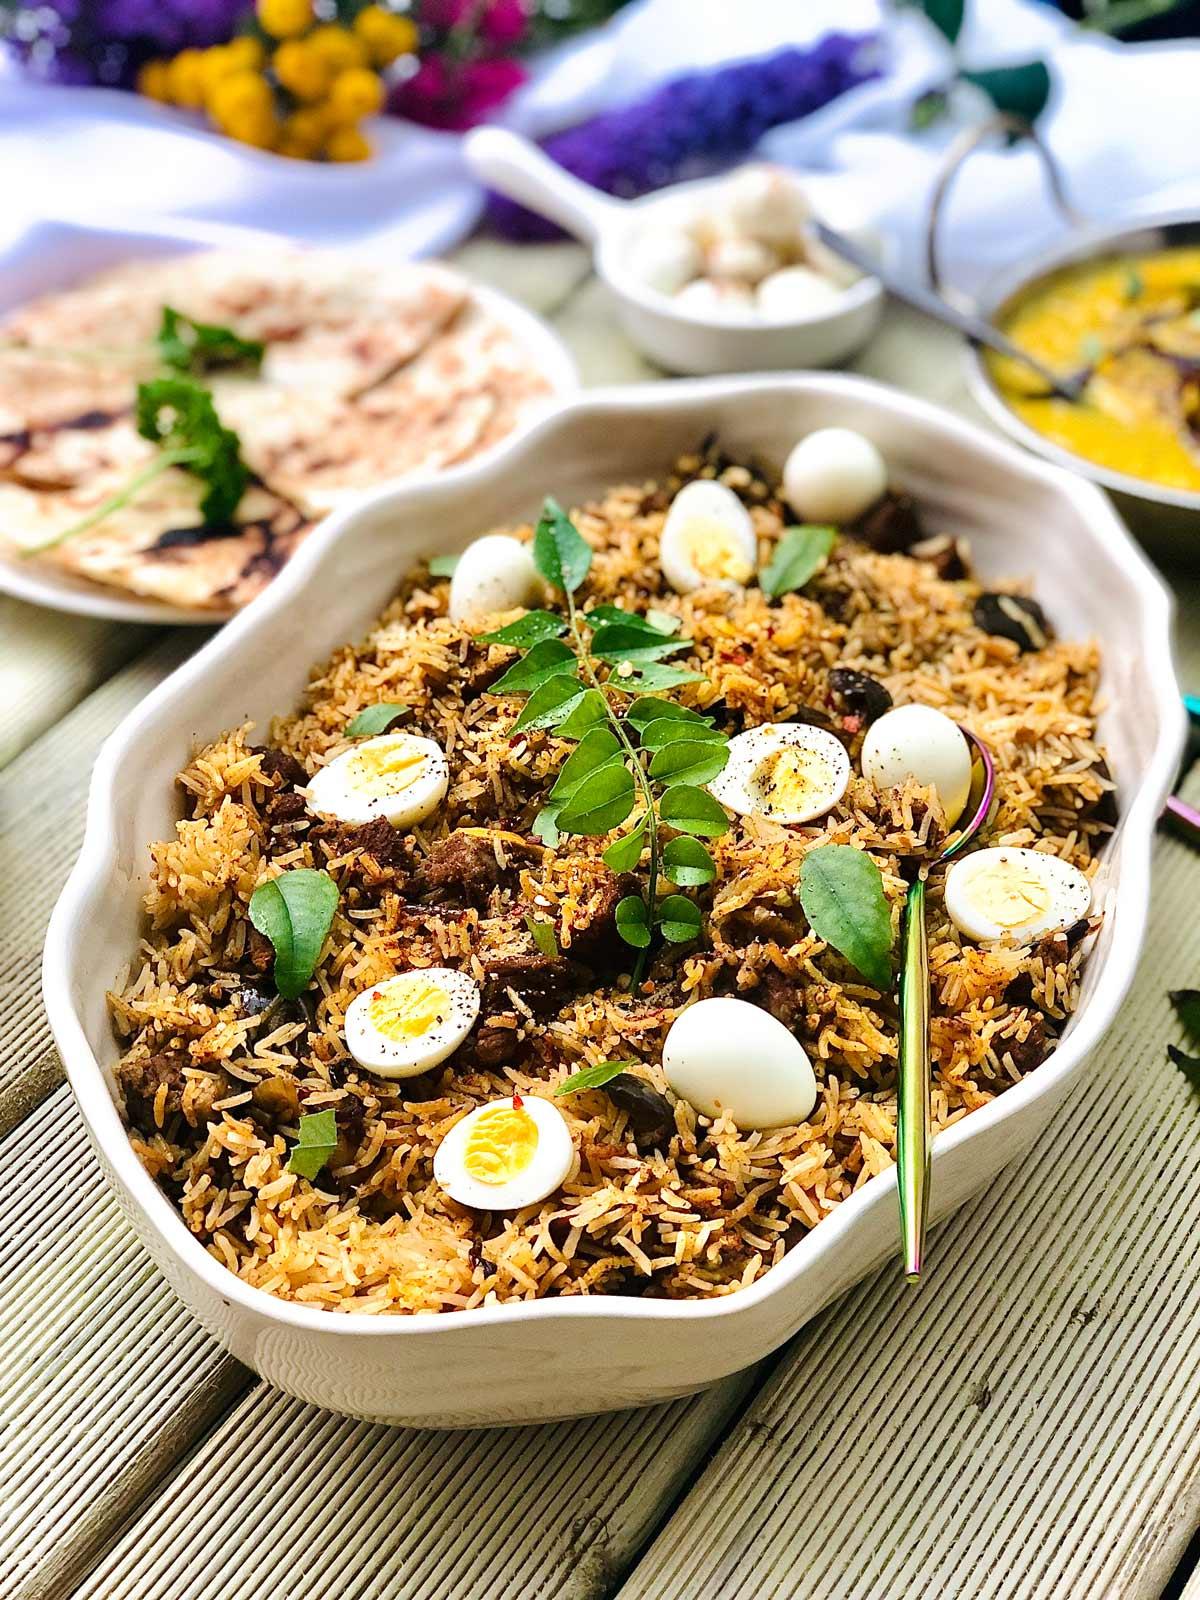 Superb Lamb Biryani with Quail Eggs in a White Dish